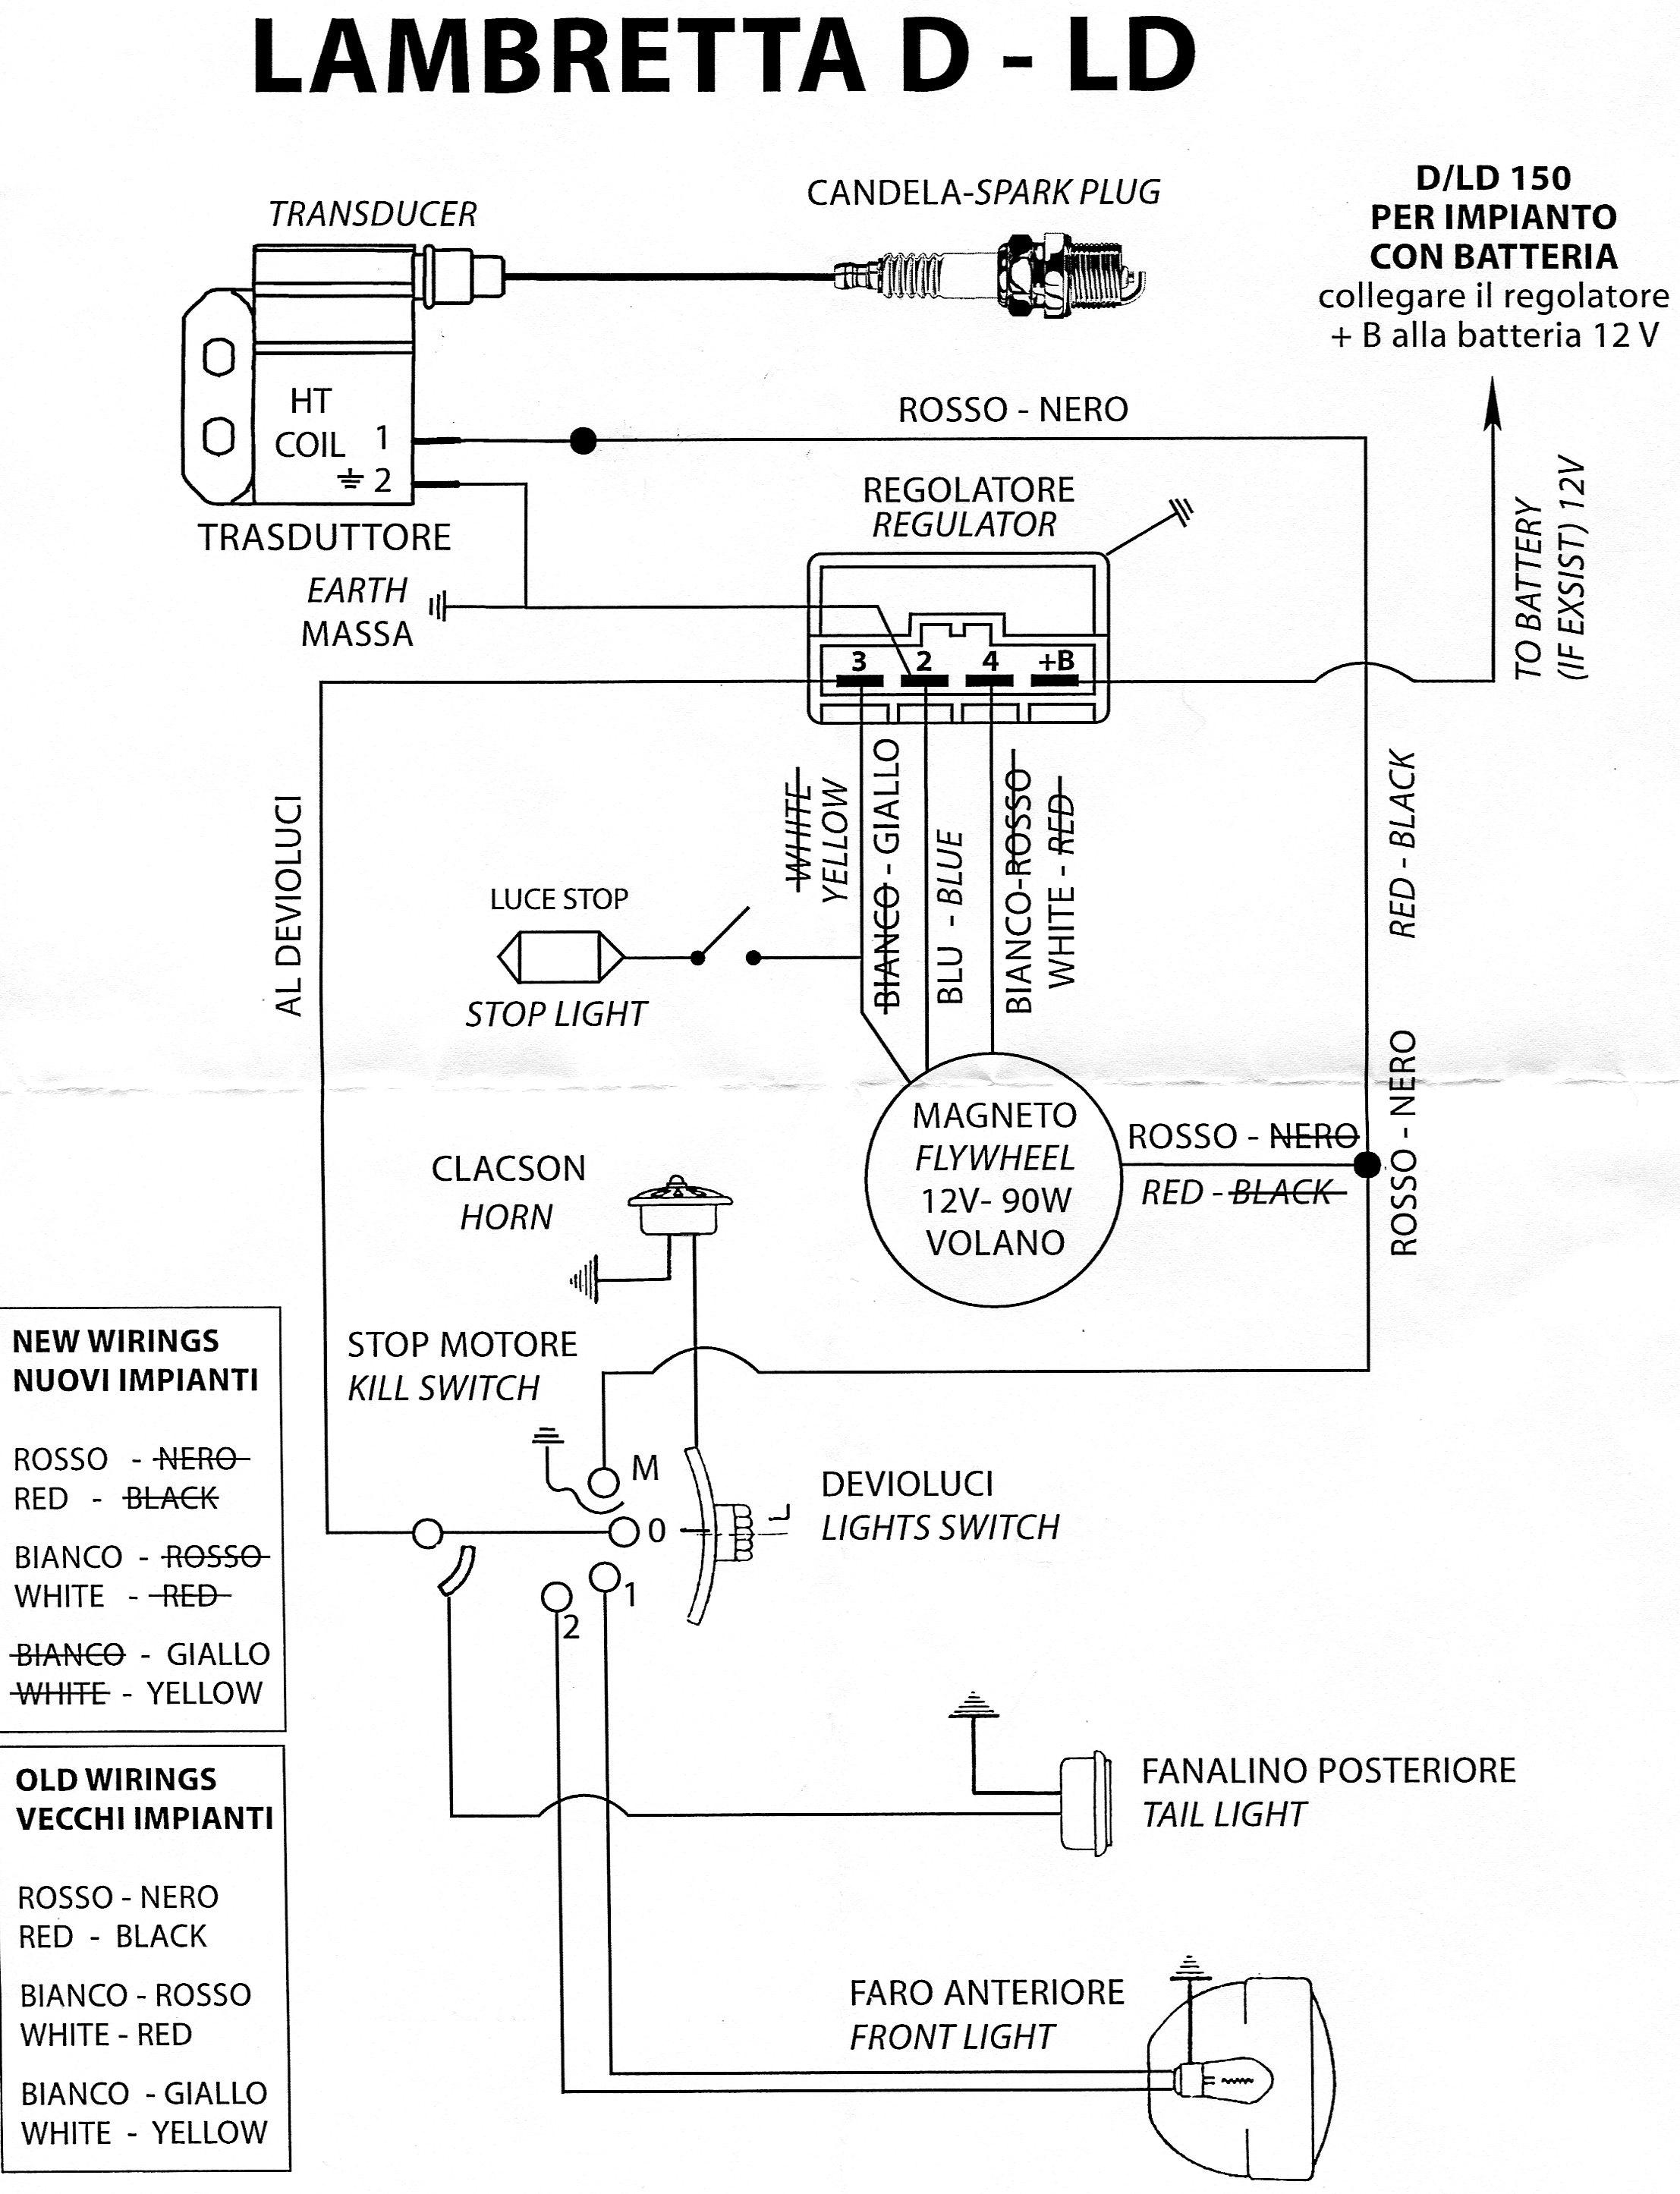 Diagram  Casatronic Ignition Lambretta Wiring Diagrams